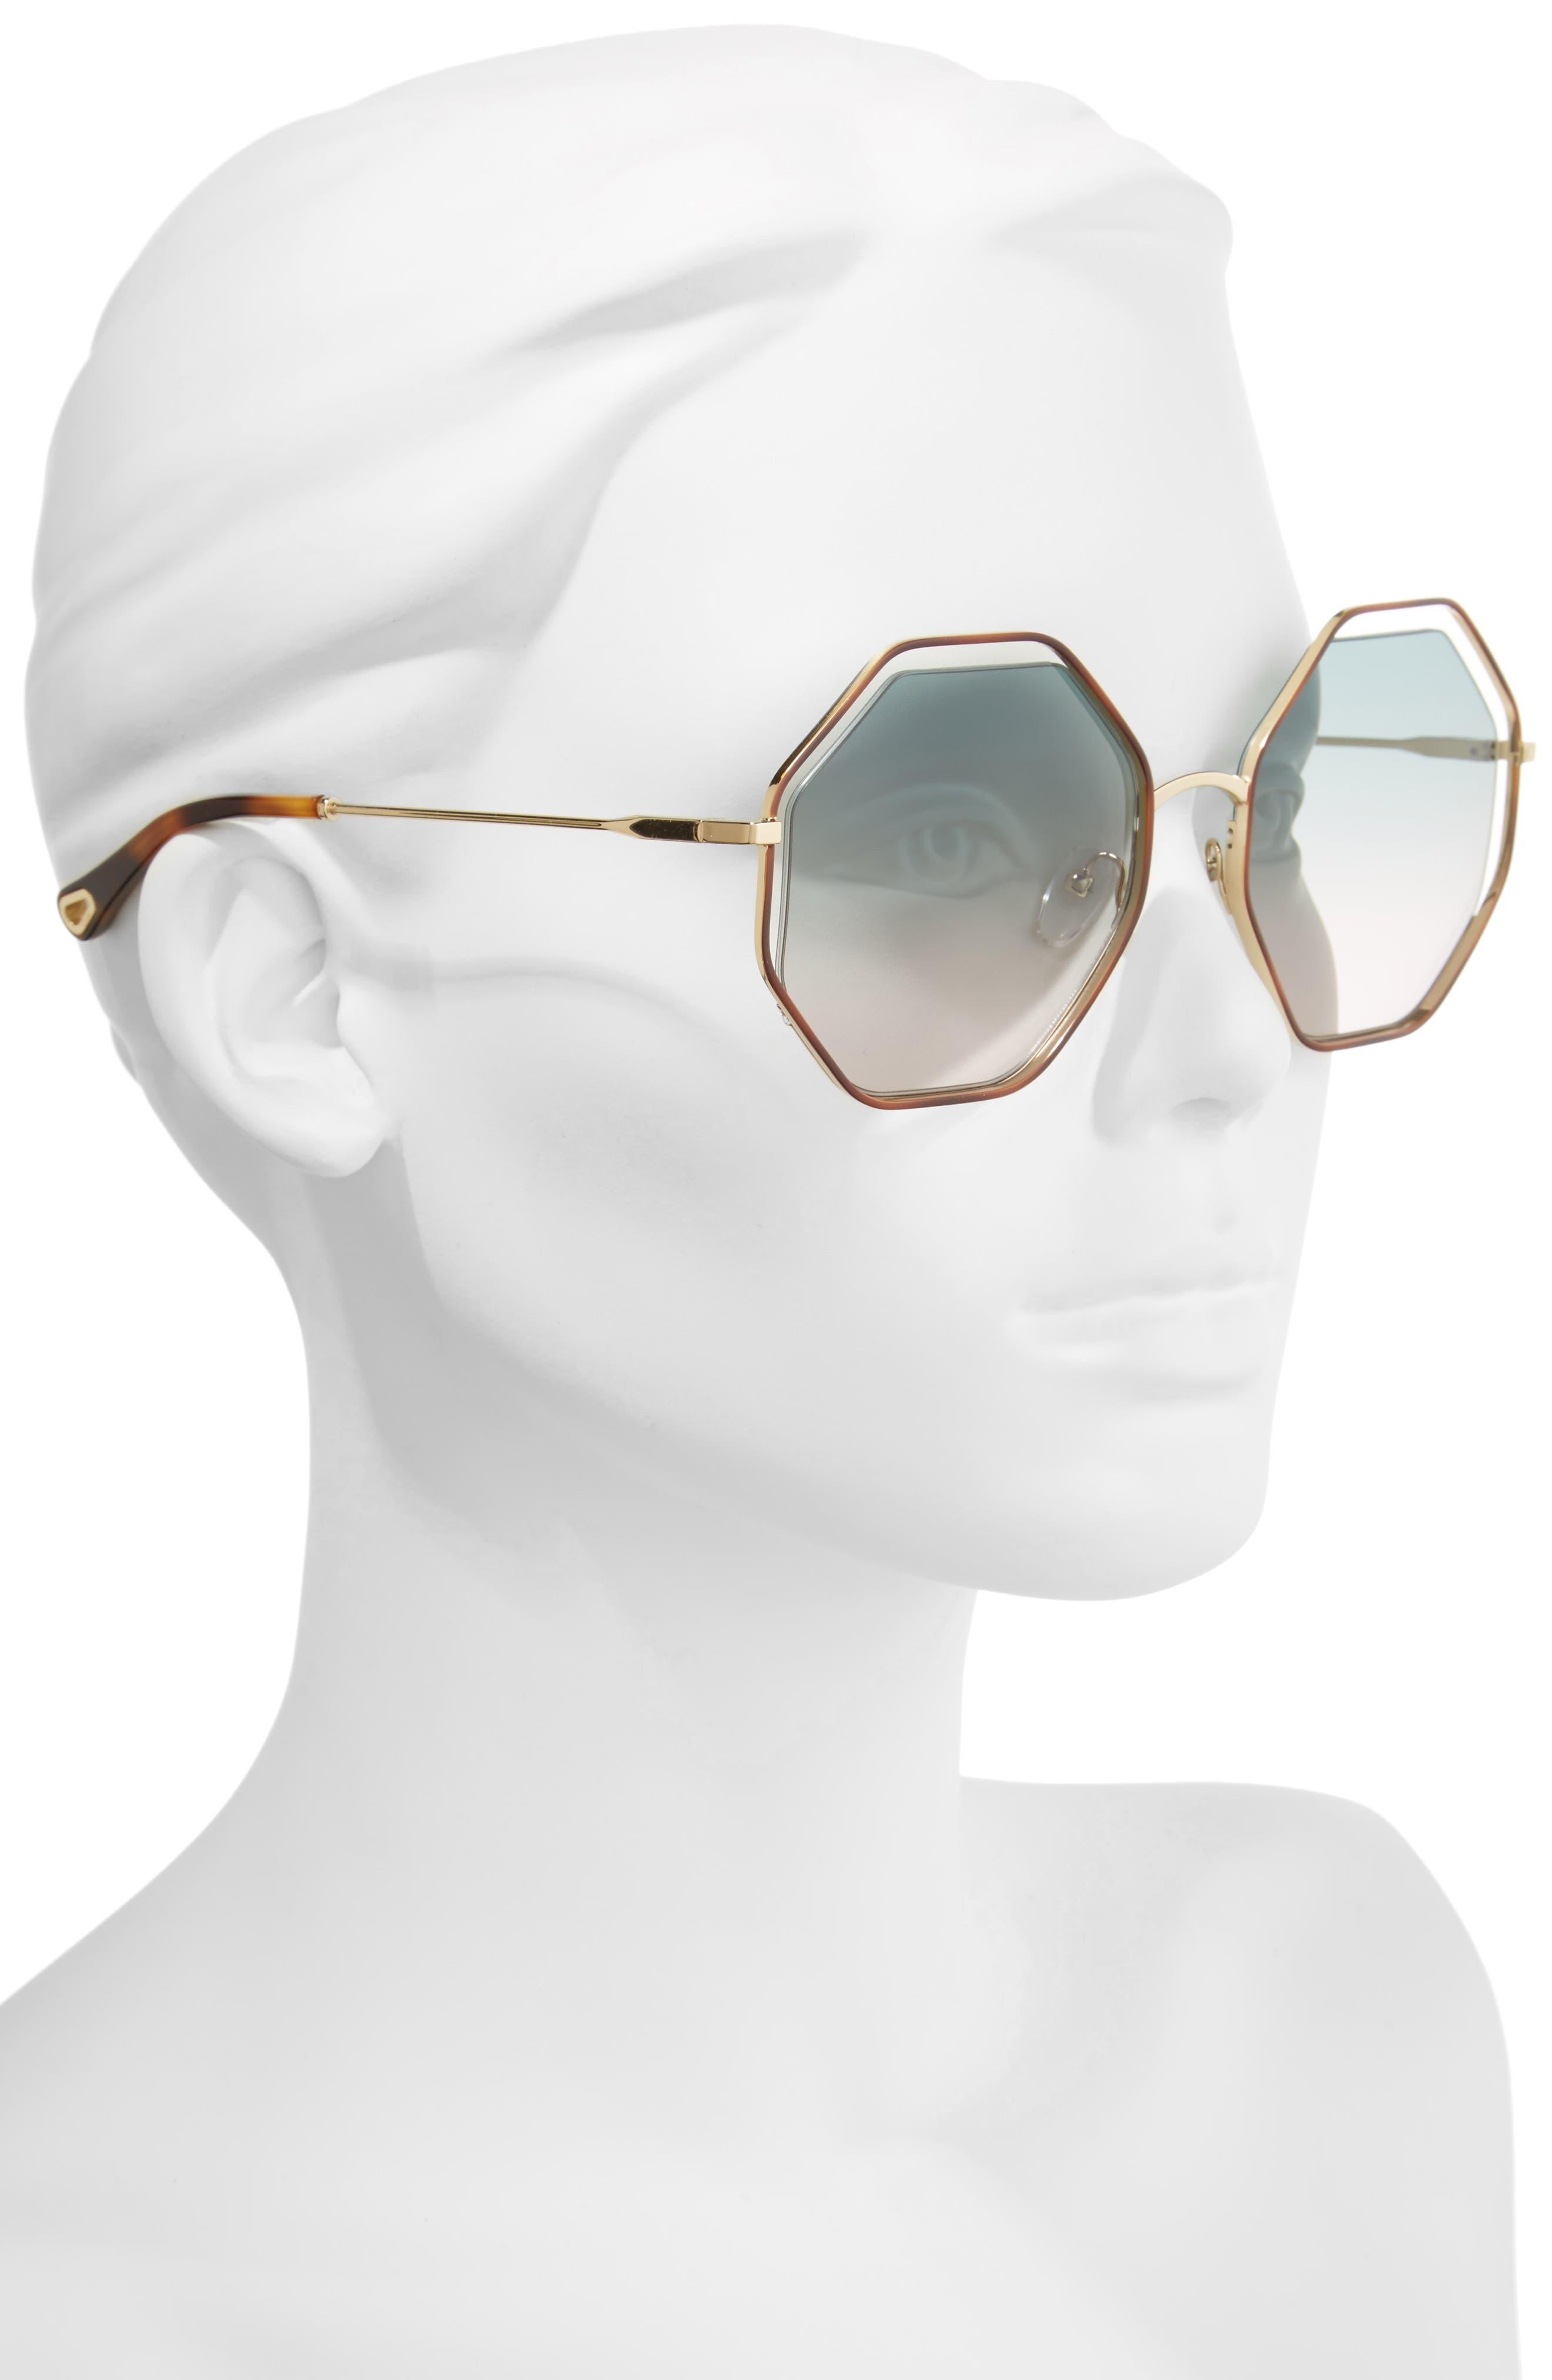 58mm Octagonal Halo Lens Sunglasses,                             Alternate thumbnail 2, color,                             Havana/ Green Rose